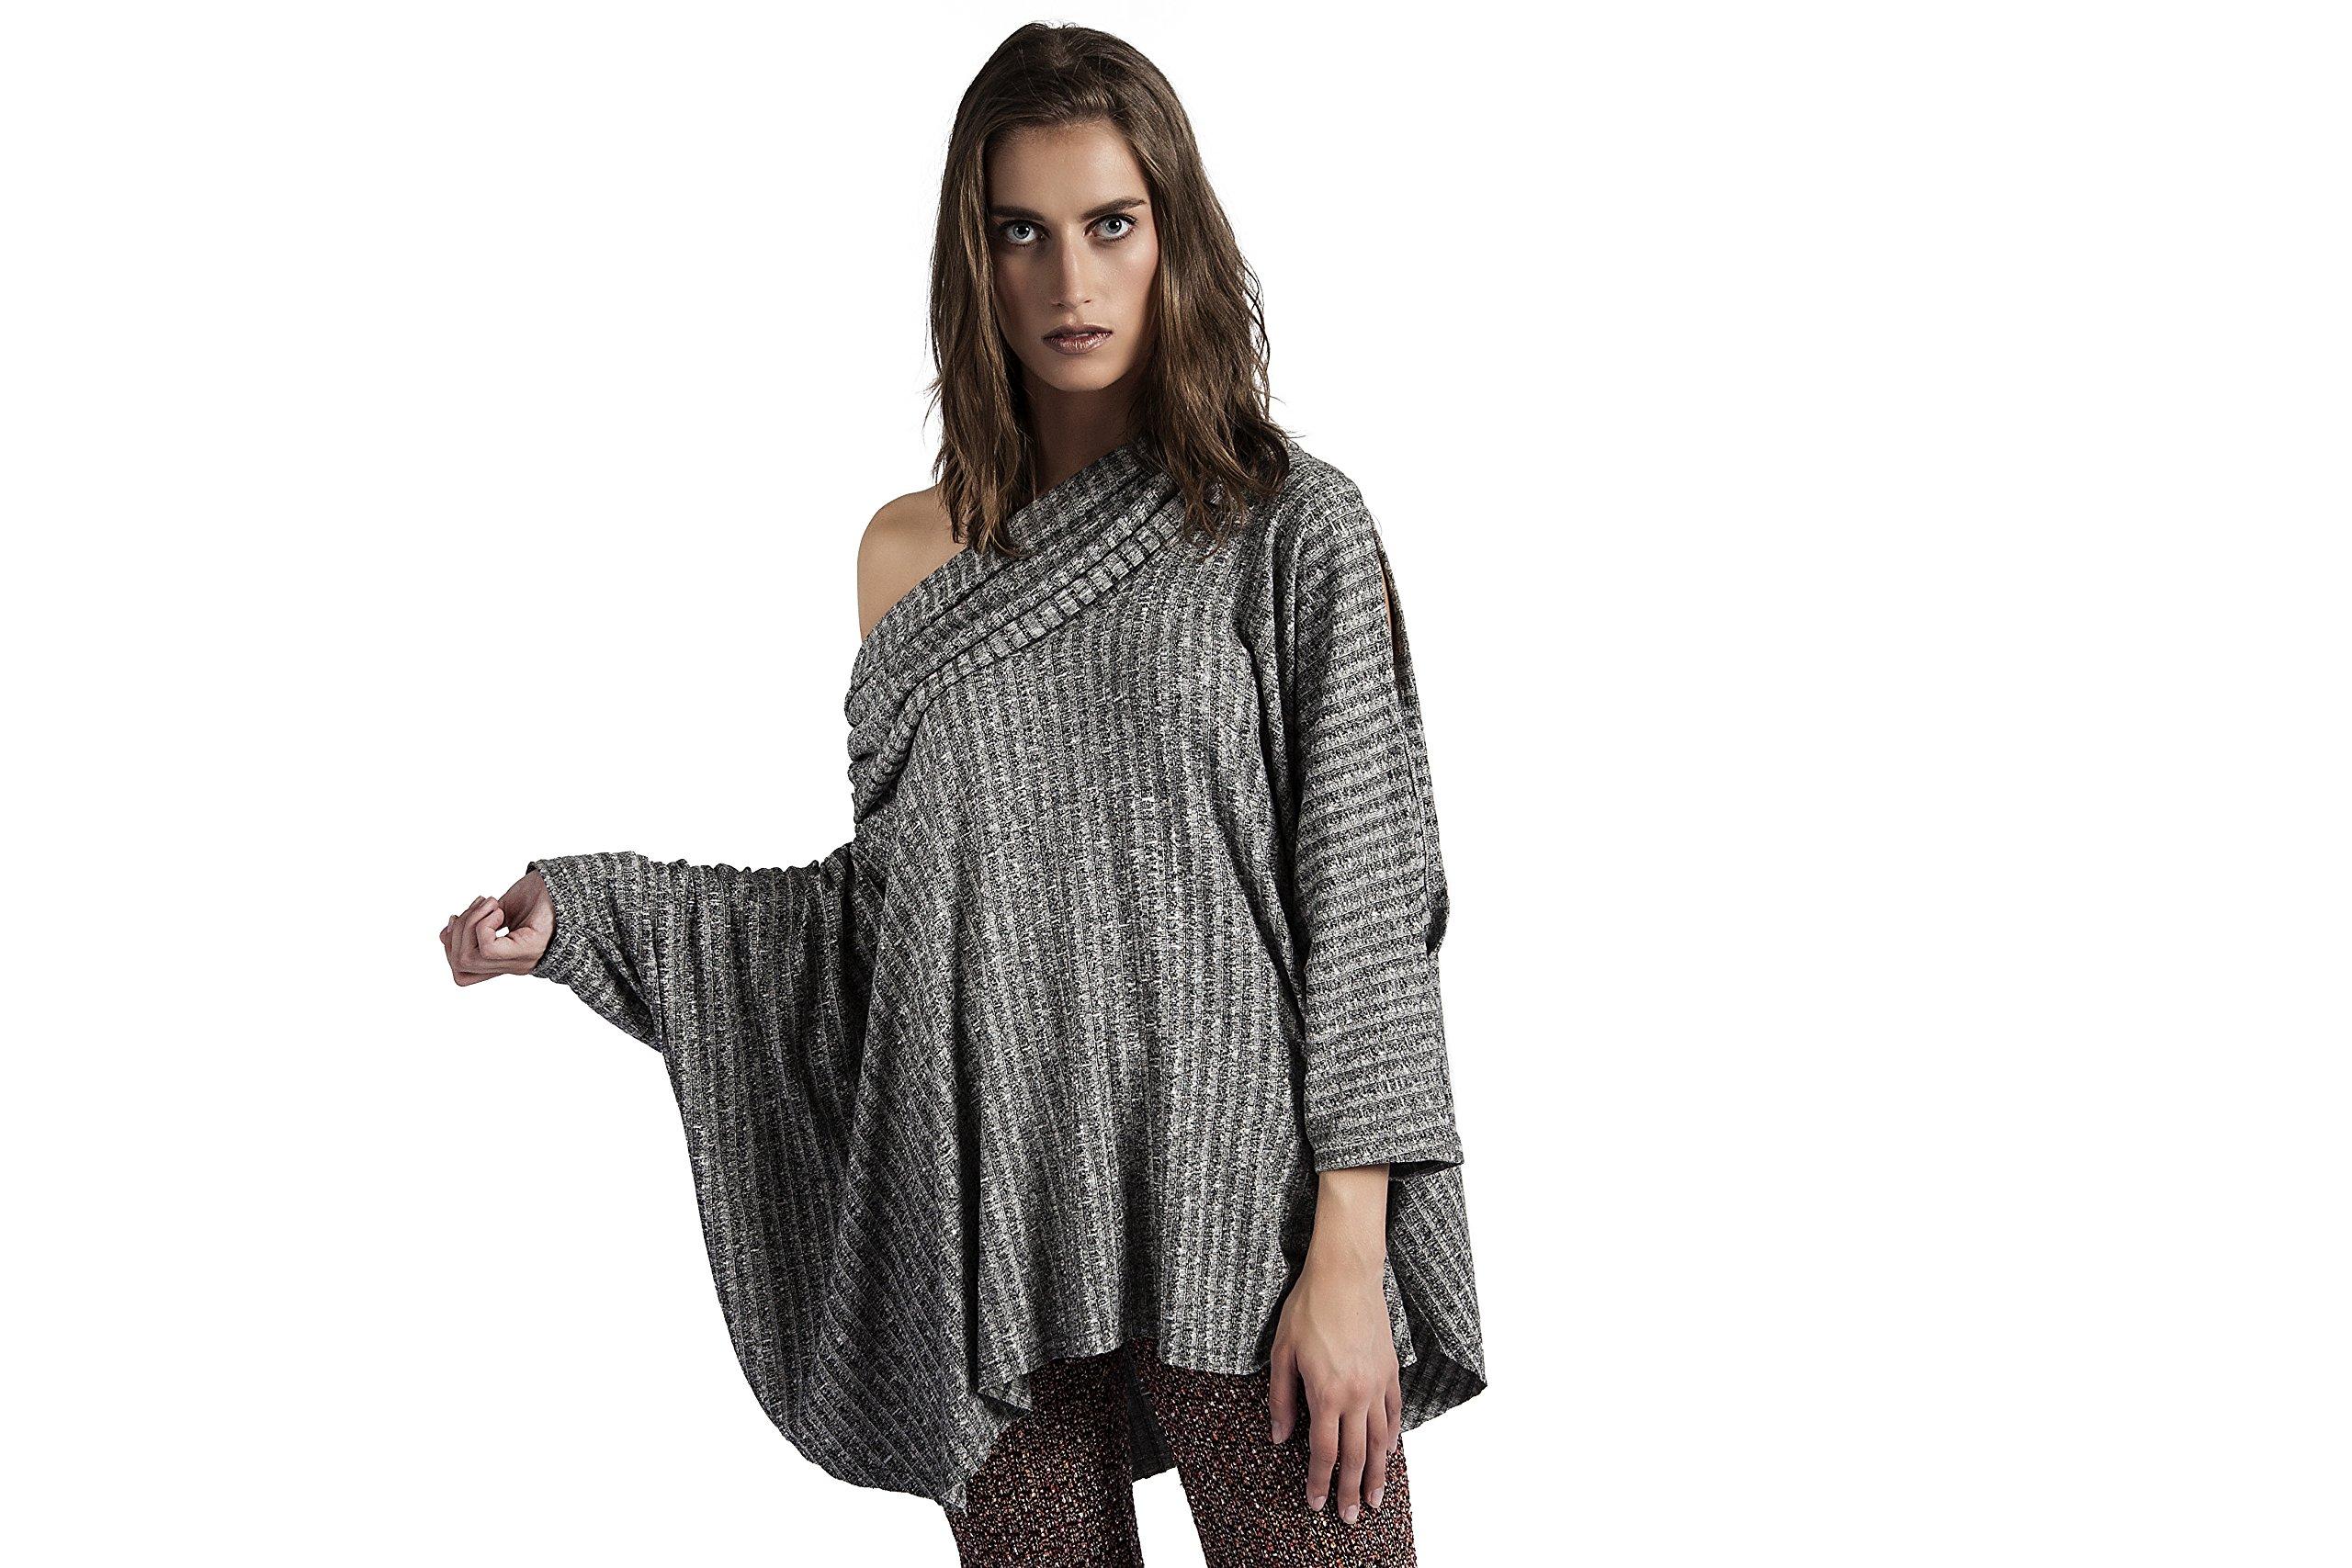 HOODIE PONCH Heidi Hess Designer Poncho Sweatshirt Converts Into Scarf, Hoodie or Top - Charcoal, One Size